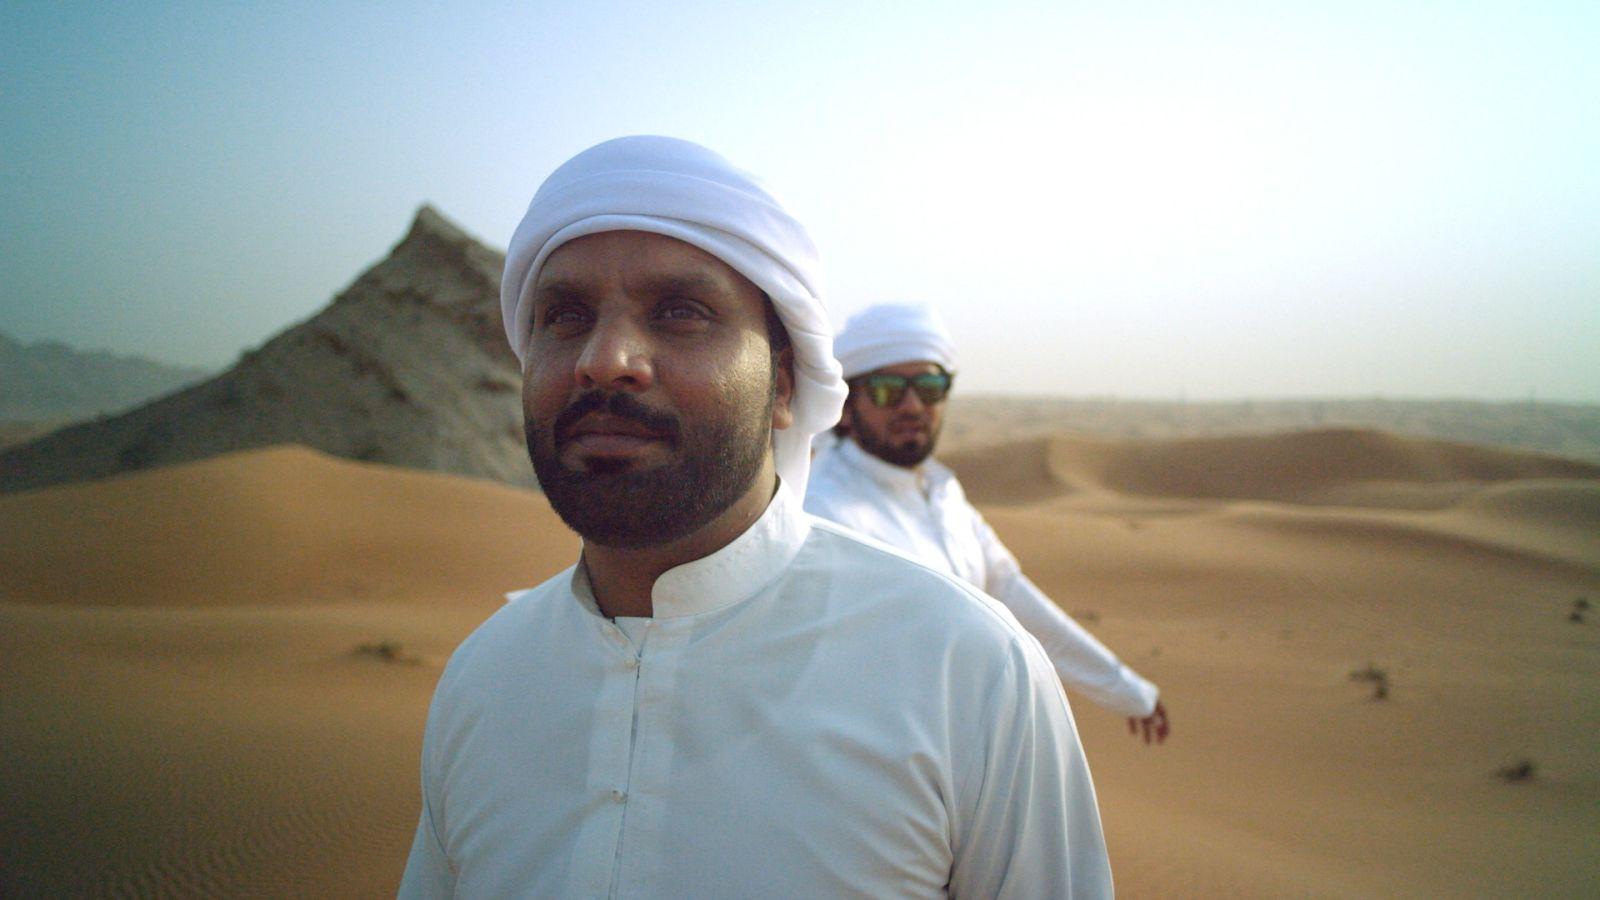 Explore the Inspiring Parts of Dubai with Photographer Rhiannon Taylor